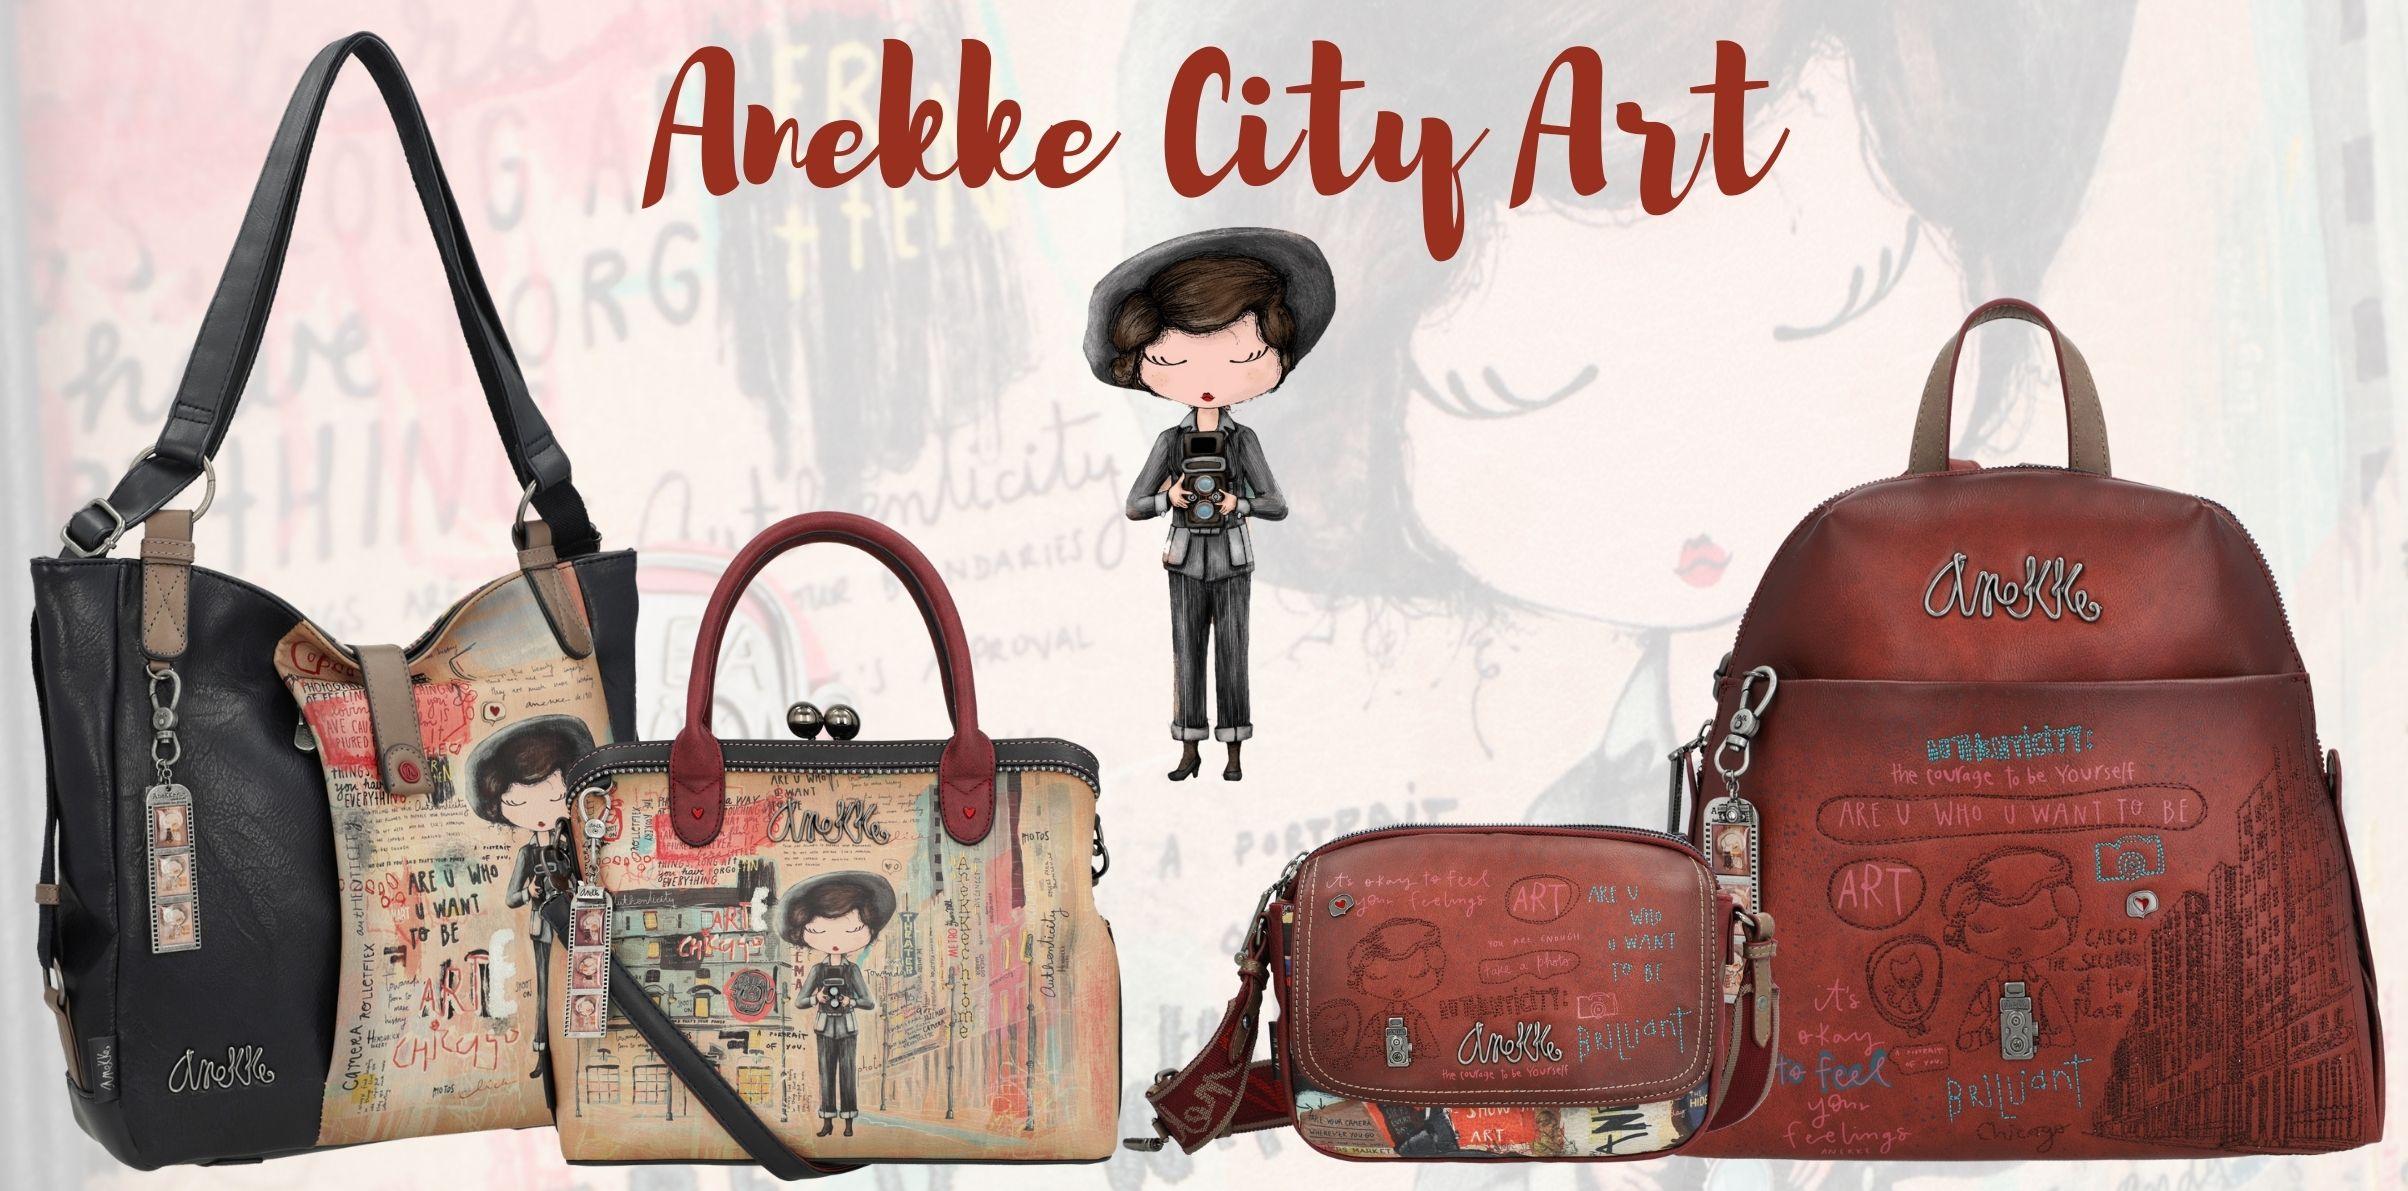 Anekke City Art